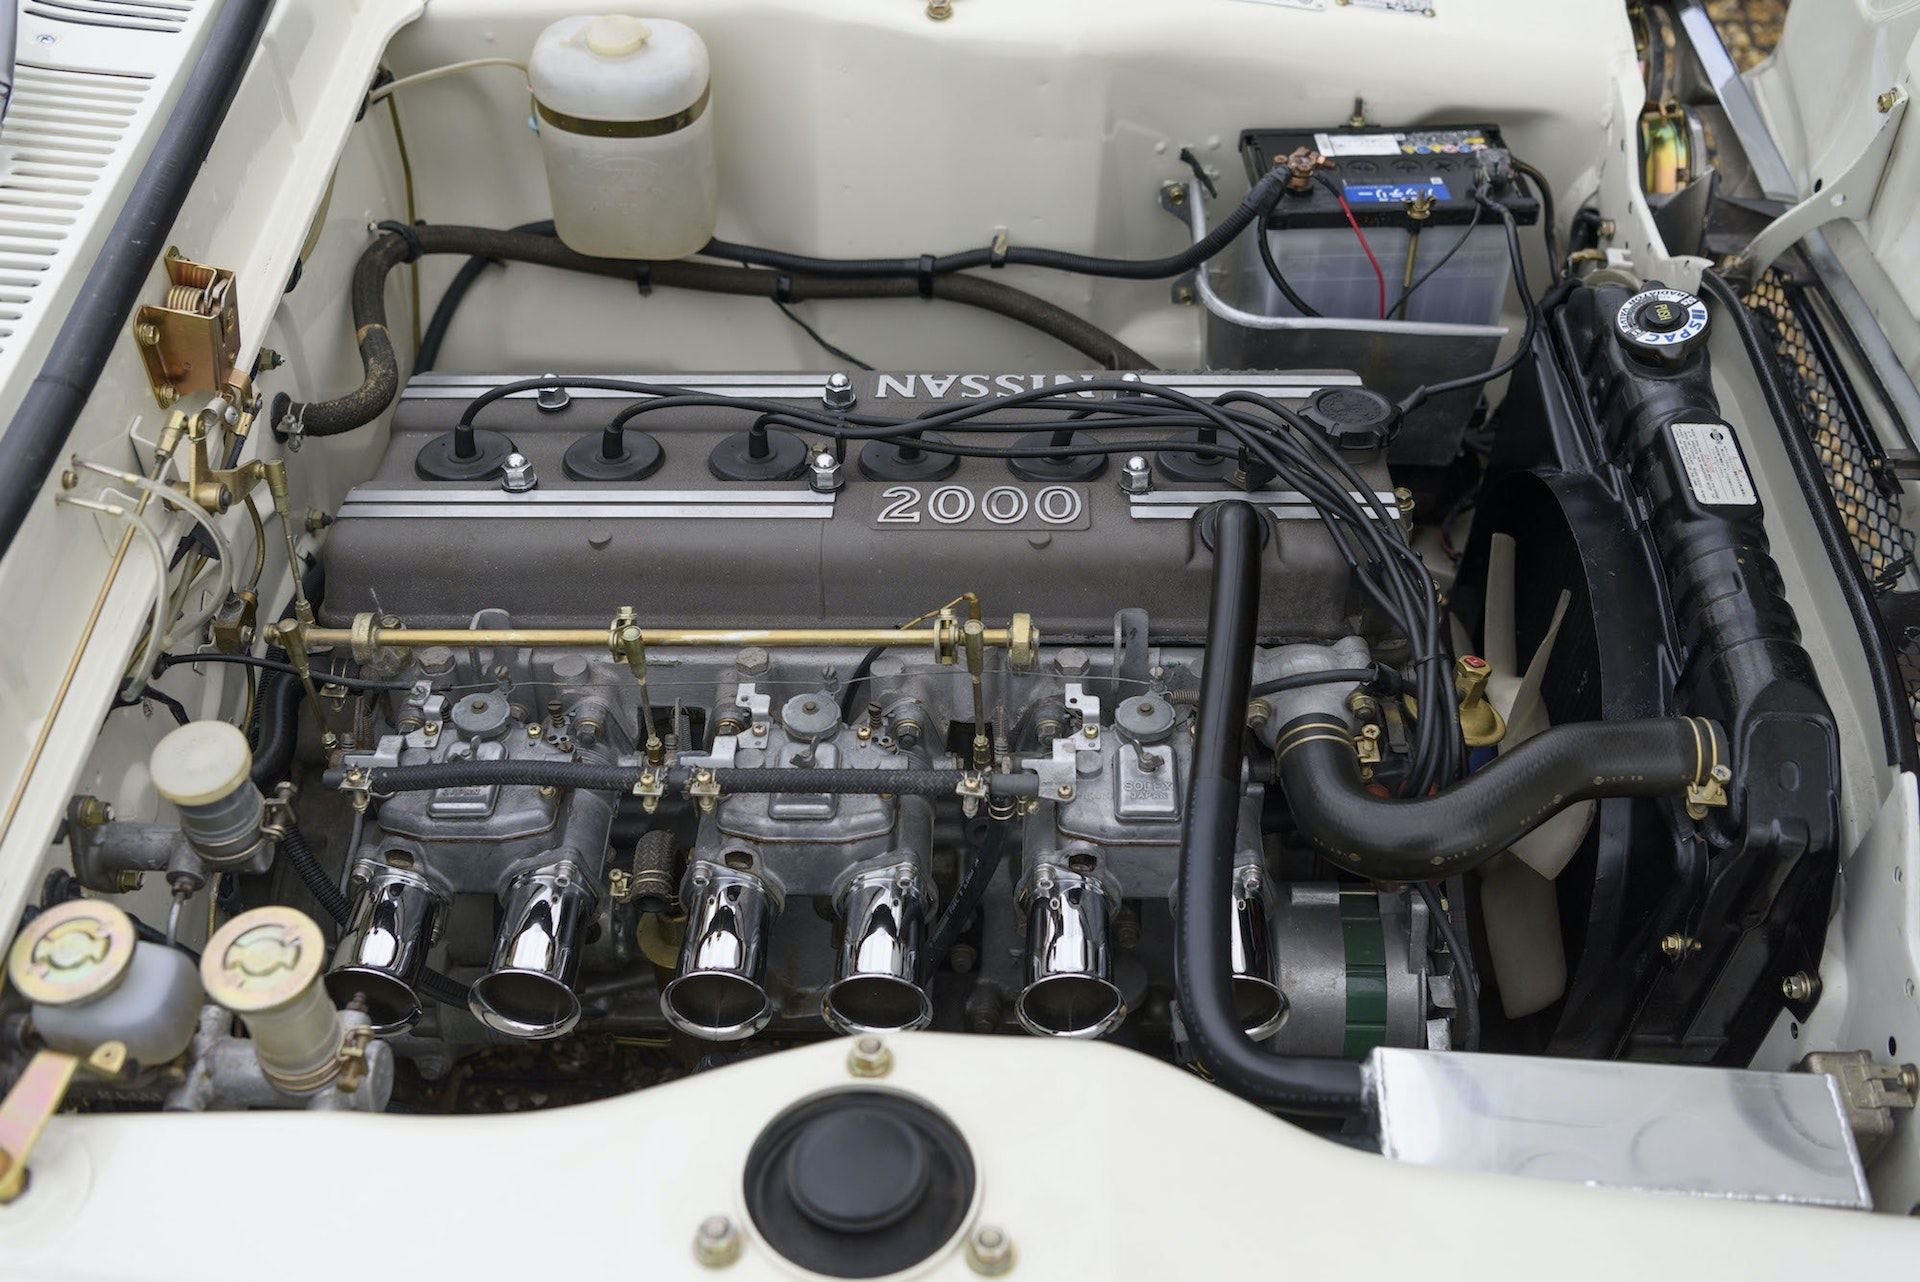 Nissan-Skyline-R32-GT-R-Hakosuka-27